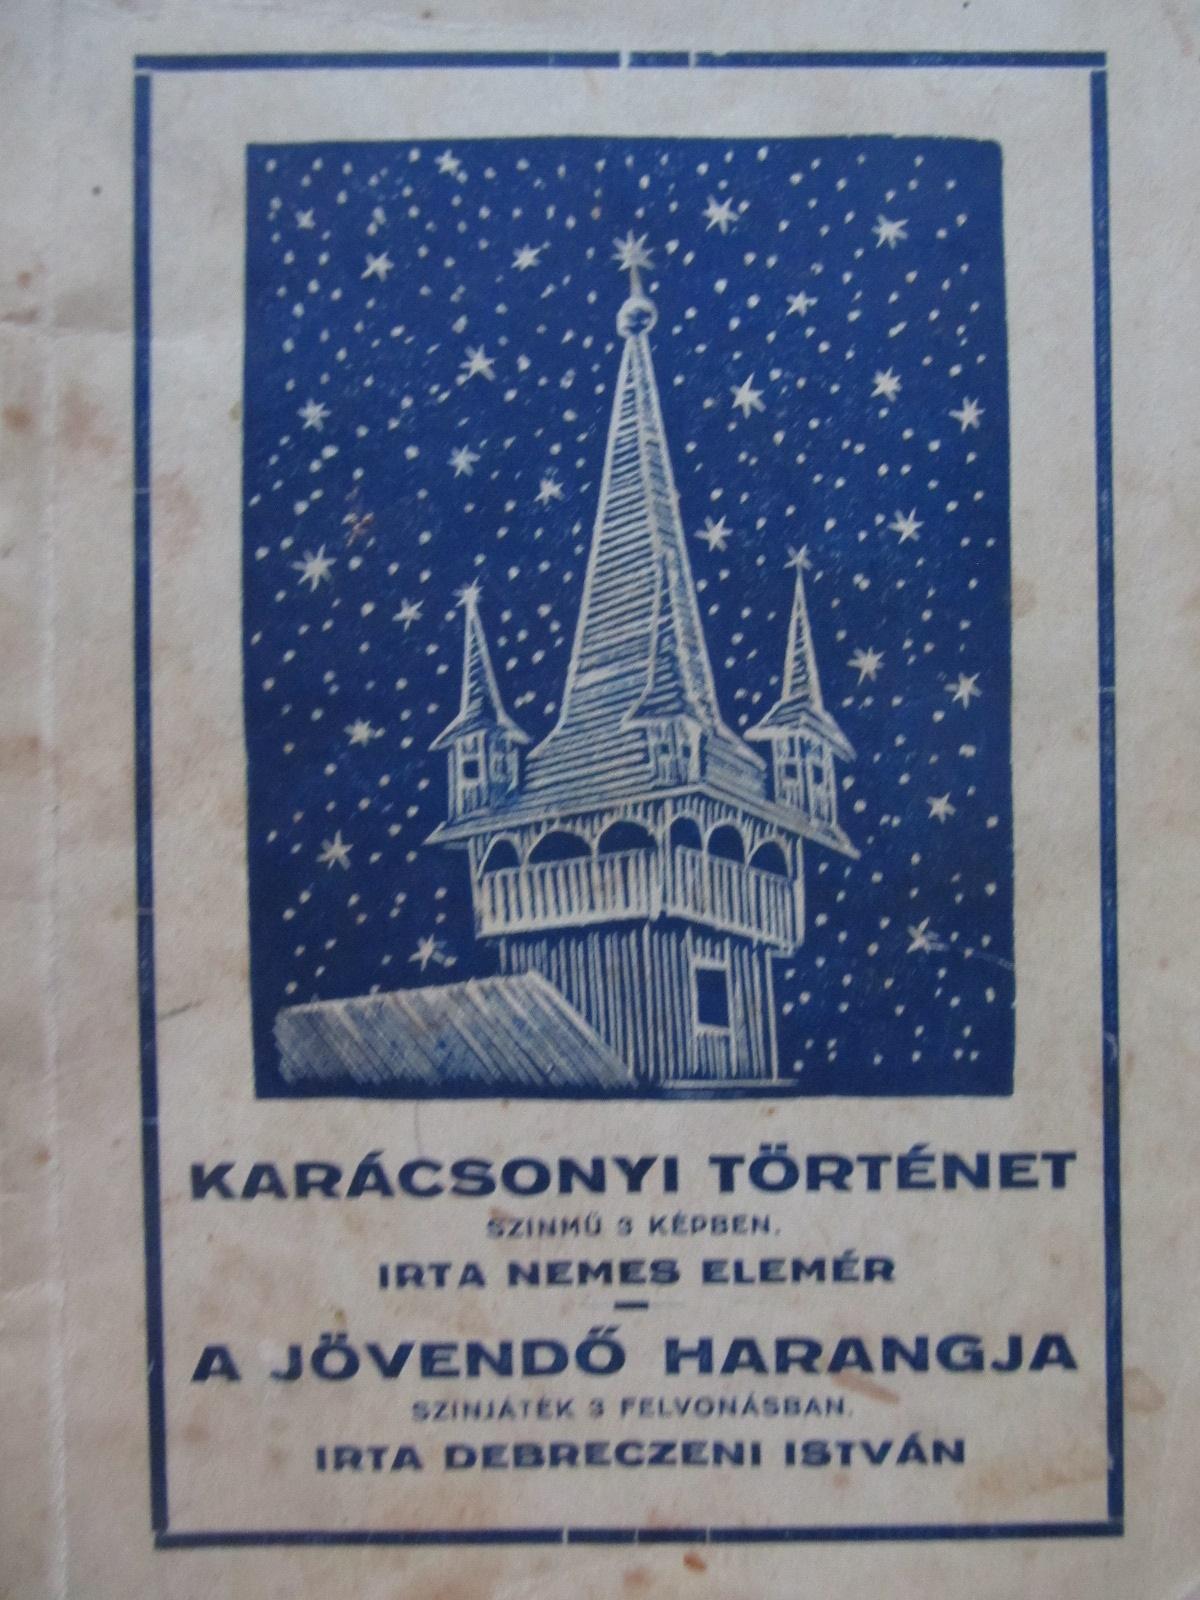 Karacsonyi tortenet (szinmu) - A Jovendo harangja (szinjatek) - Nemes Elemer , Debreczeni Istvan | Detalii carte